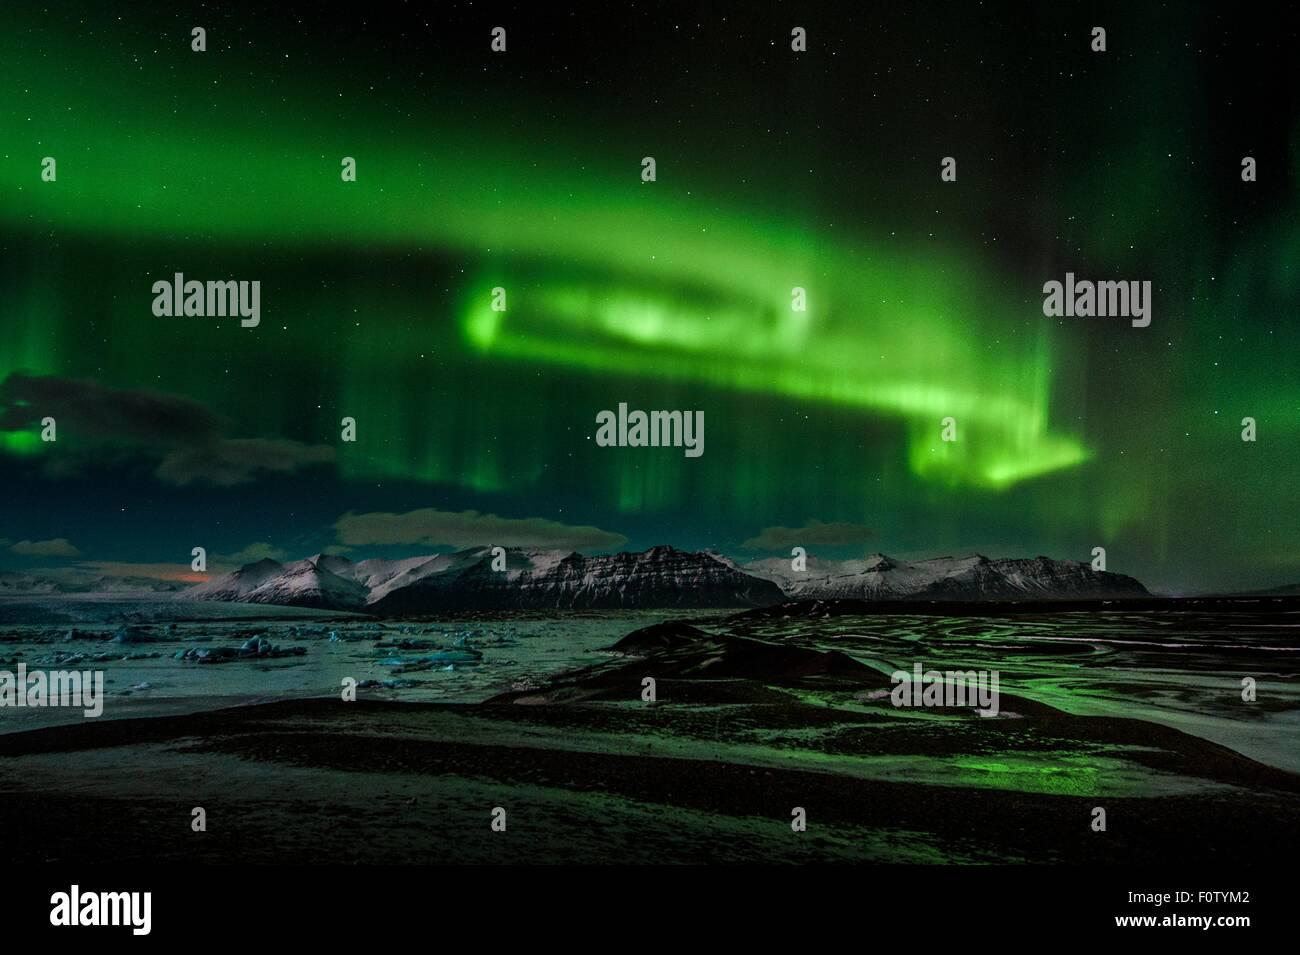 Northern lights, Glacier Lake South, Iceland - Stock Image